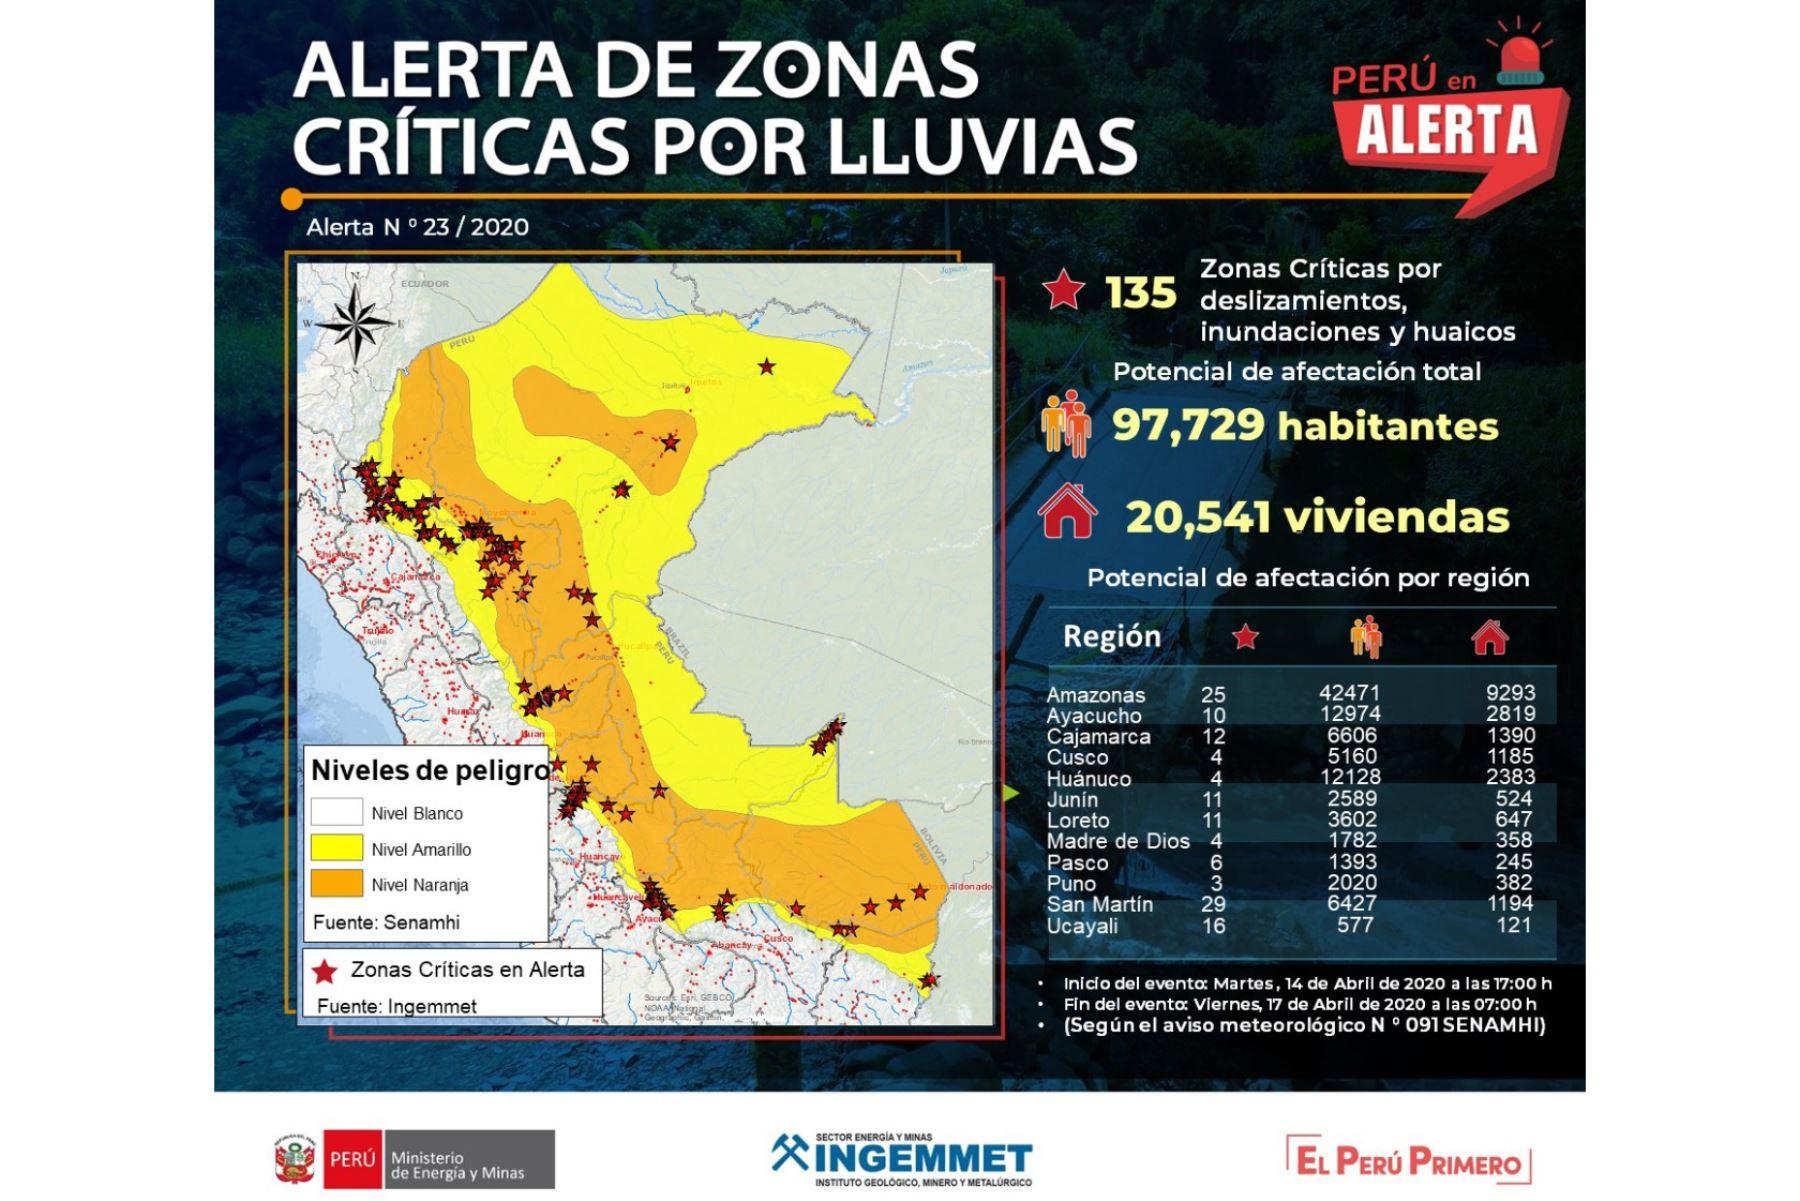 El Ingemmet advirtió que 97,729 habitantes de la Selva podrían ser perjudicados por lluvias. Foto: ANDINA/Difusión